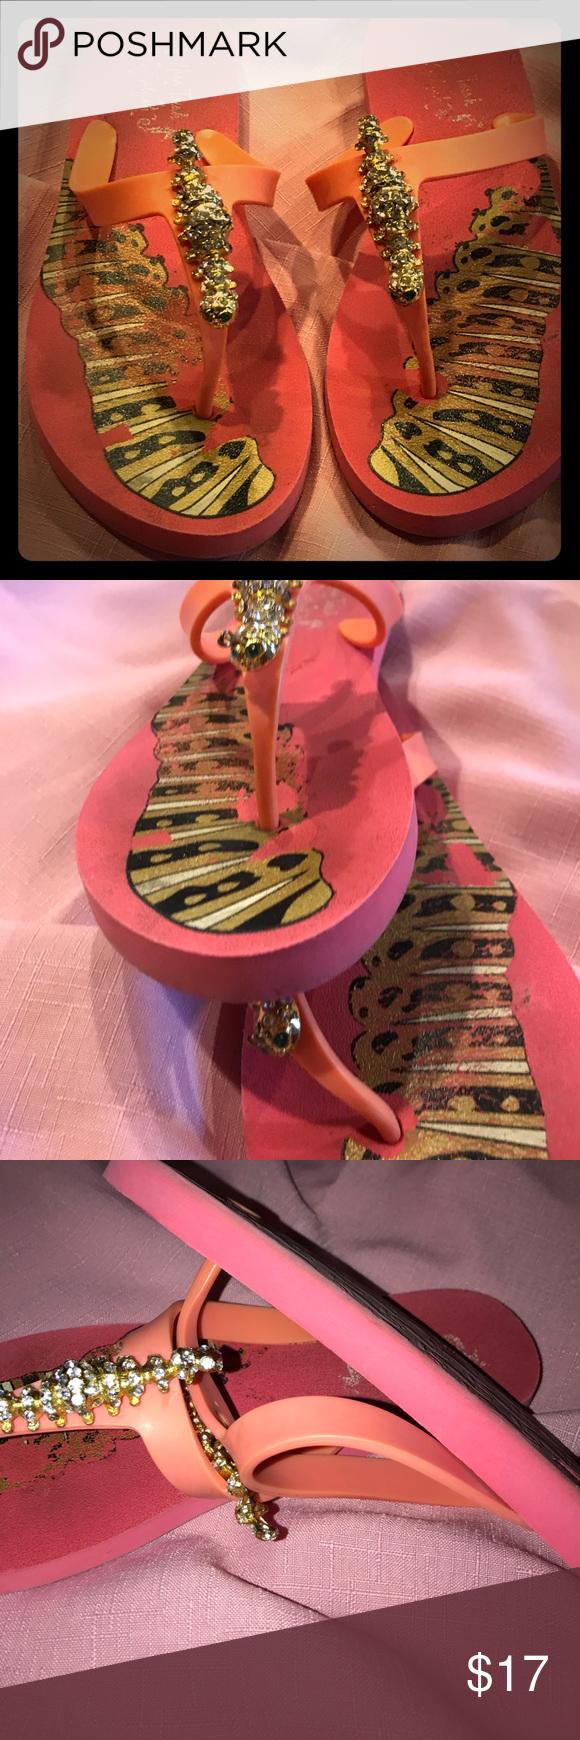 Miss Trish catapillar sandels. $$$$$17 Very nice good condition. miss trish Shoes Sandals